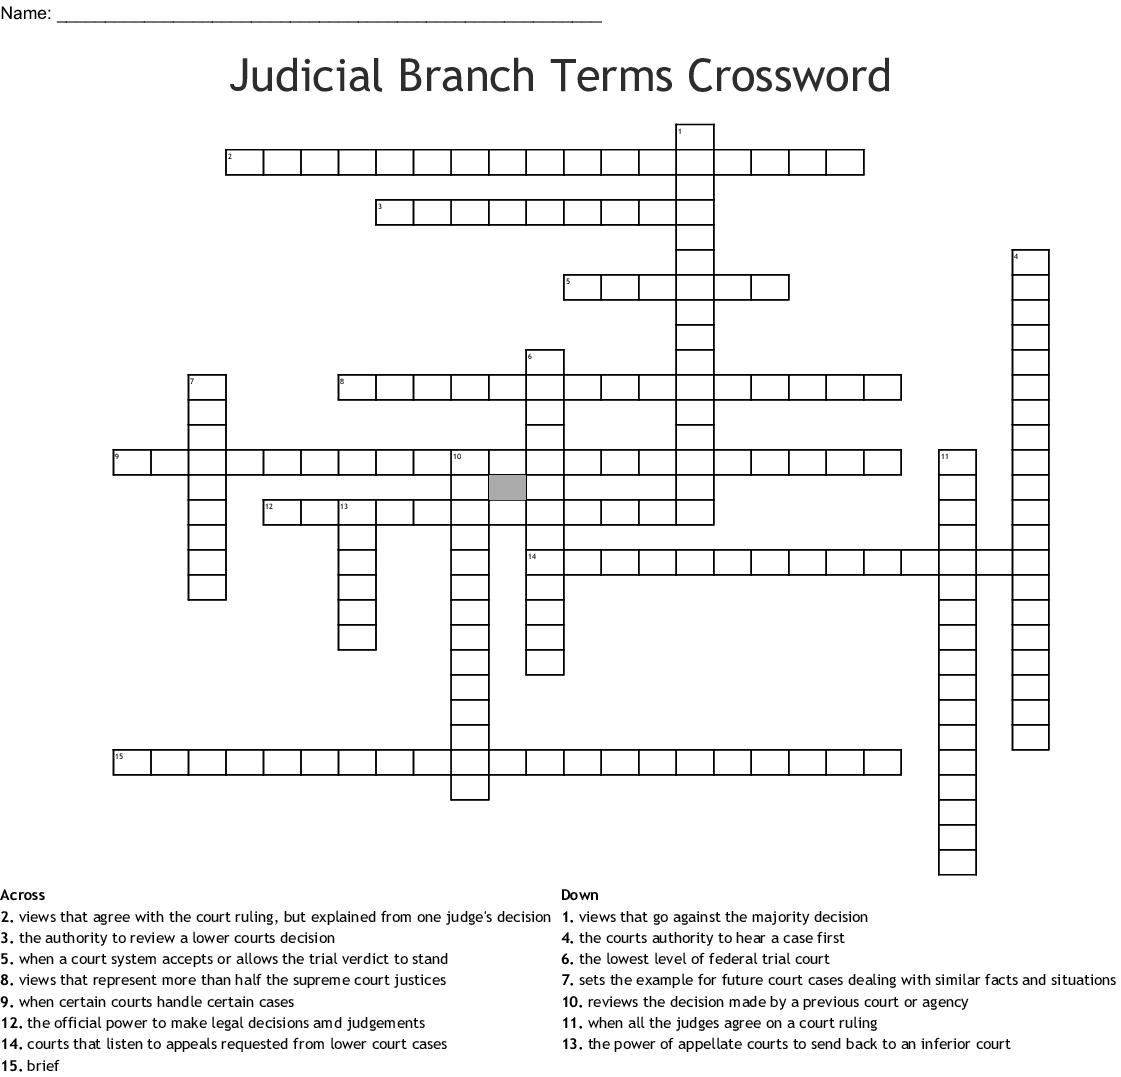 Judicial Branch Key Terms Crossword